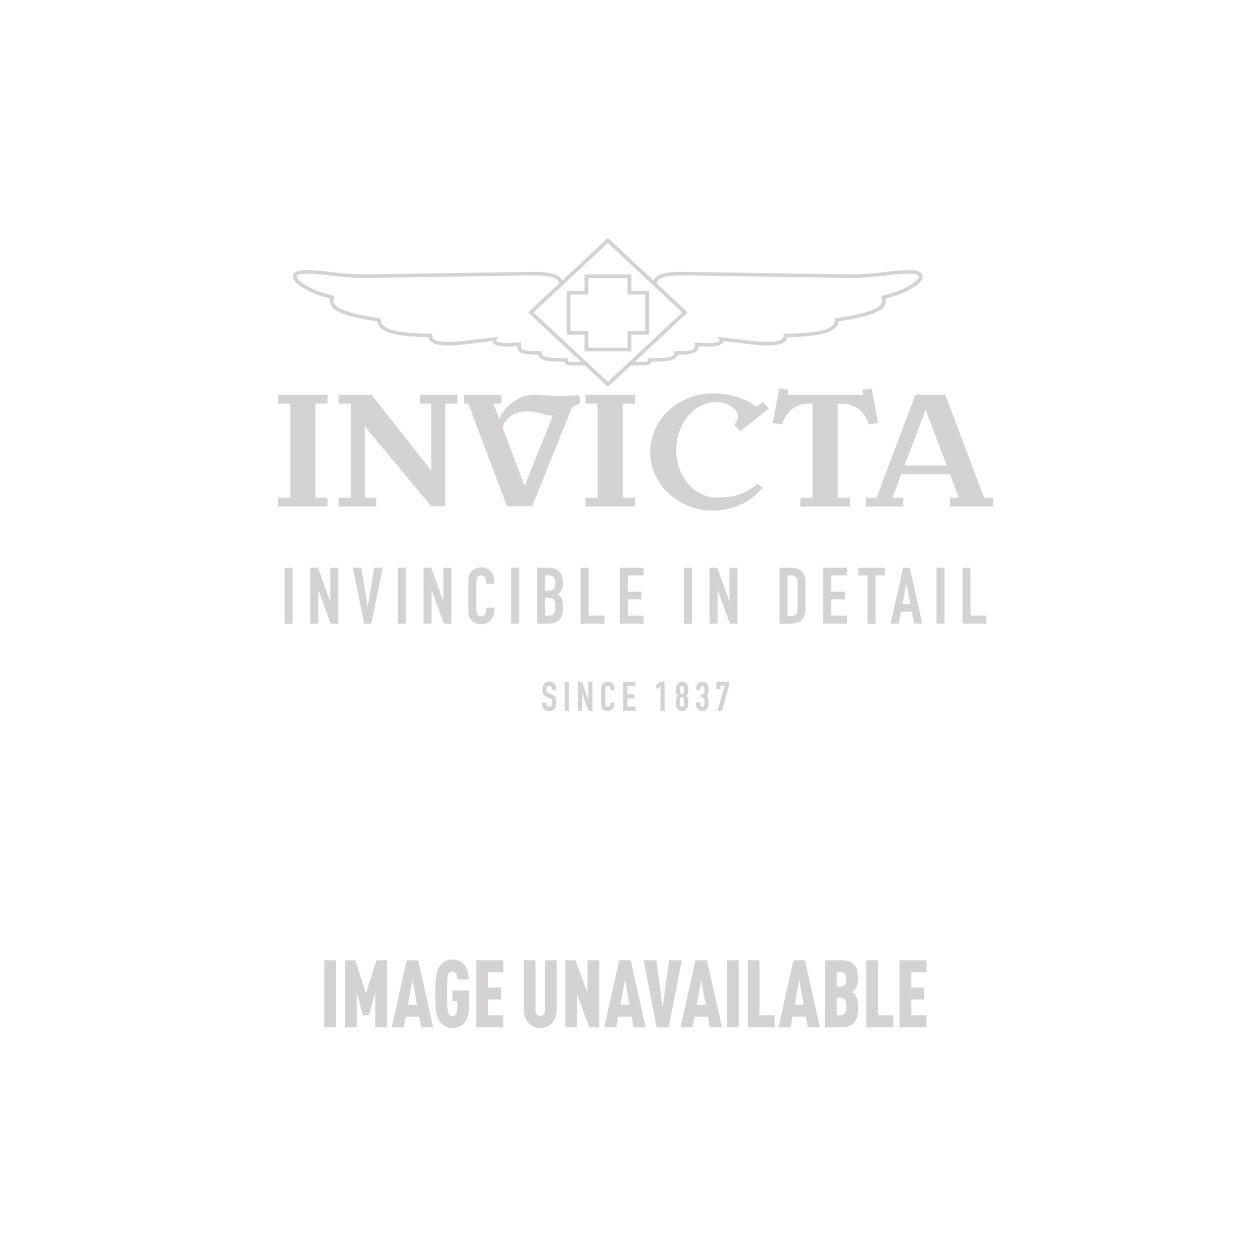 Invicta Venom  Quartz Watch - Stainless Steel case with Steel, Black tone Stainless Steel, Polyurethane band - Model 6110